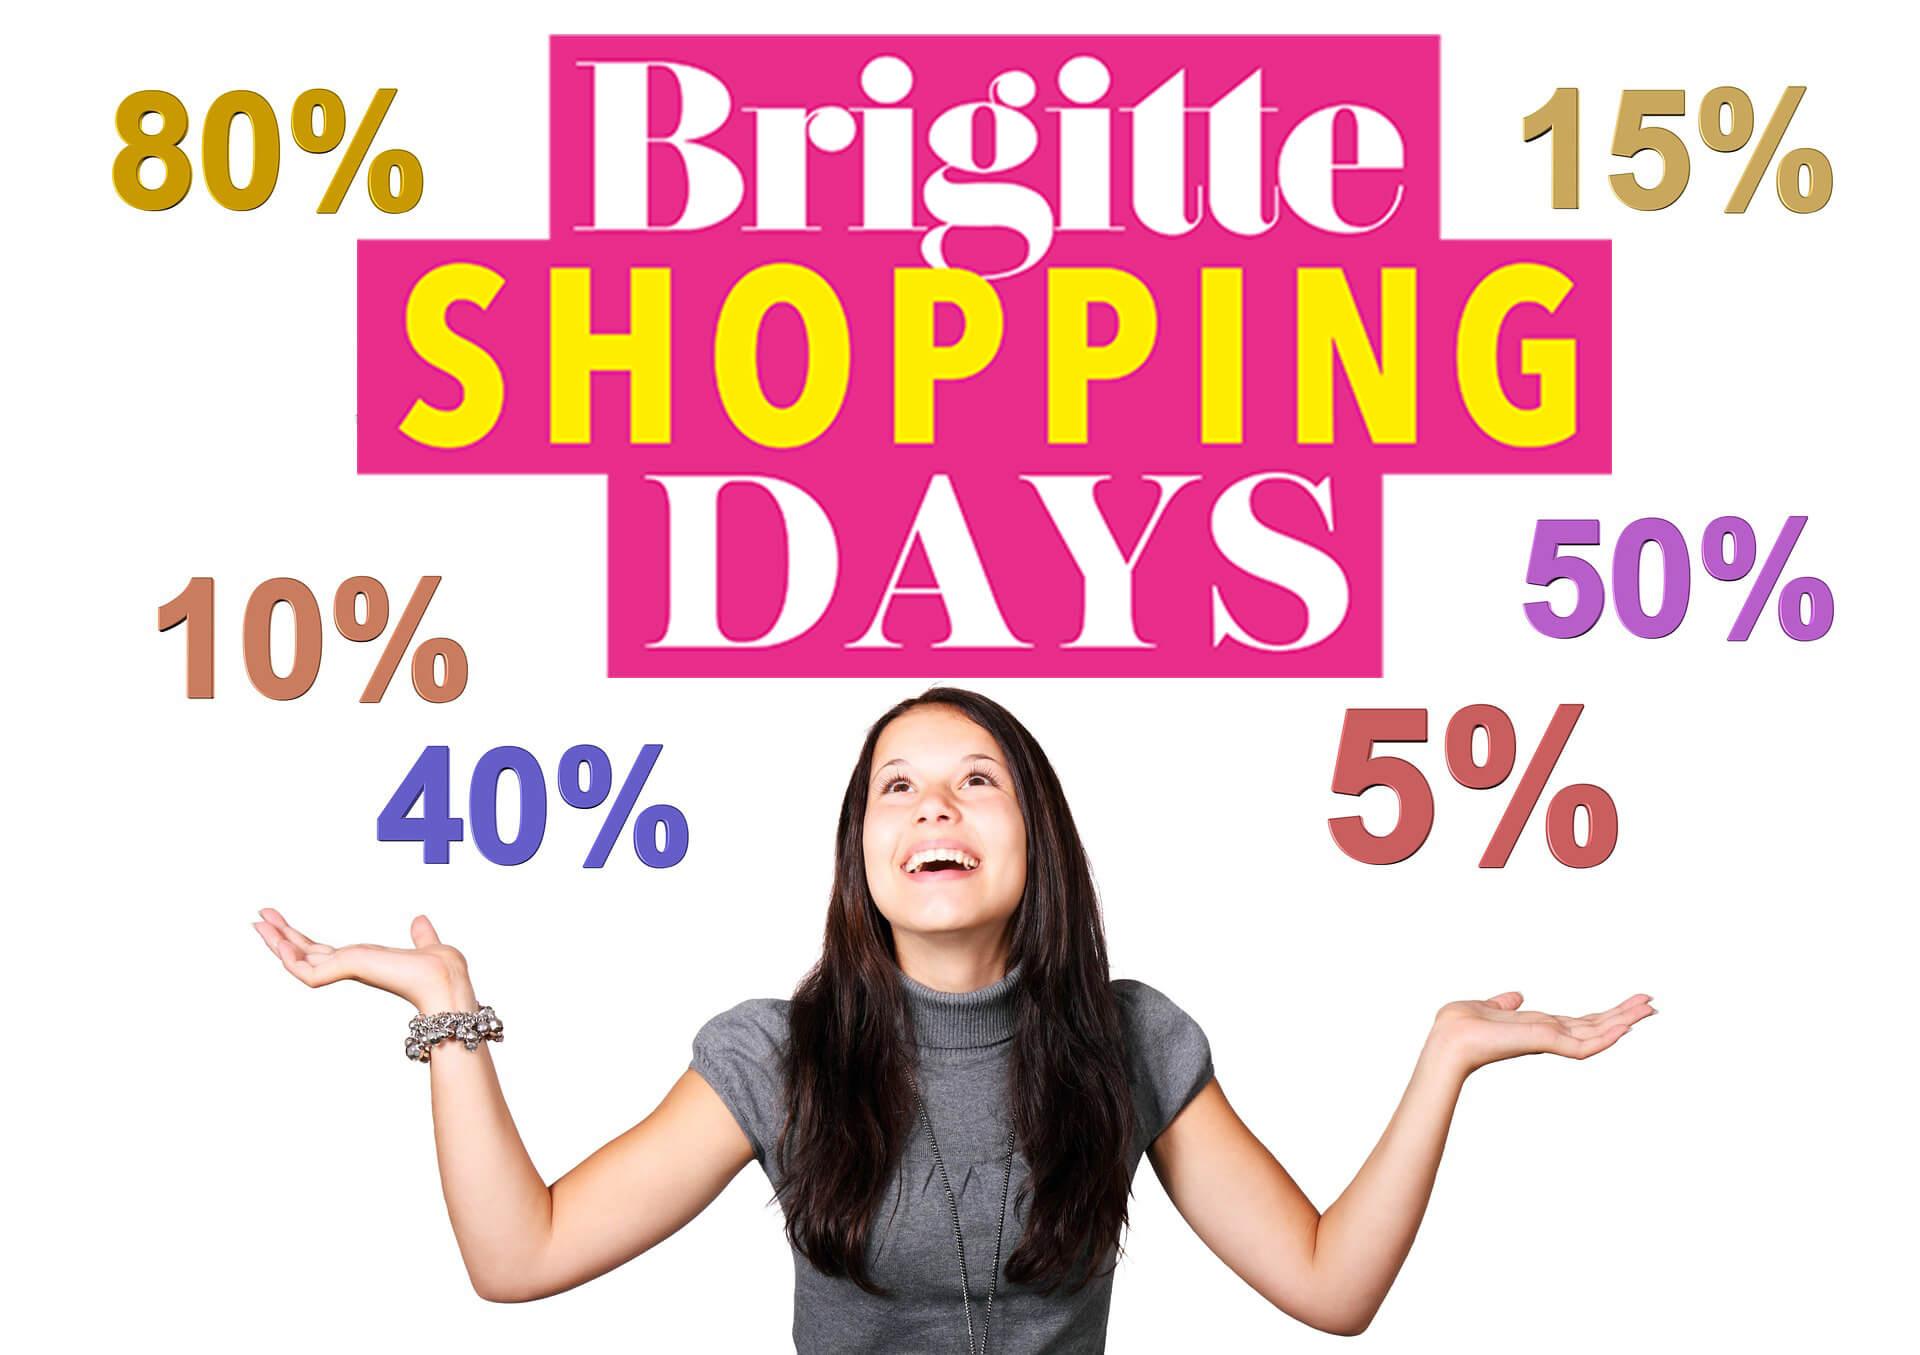 Brigitte Shopping Days: 25% Flaconi, 20€ Götz, 15% About You, 15% StreetOne usw. bis 16.03.2020